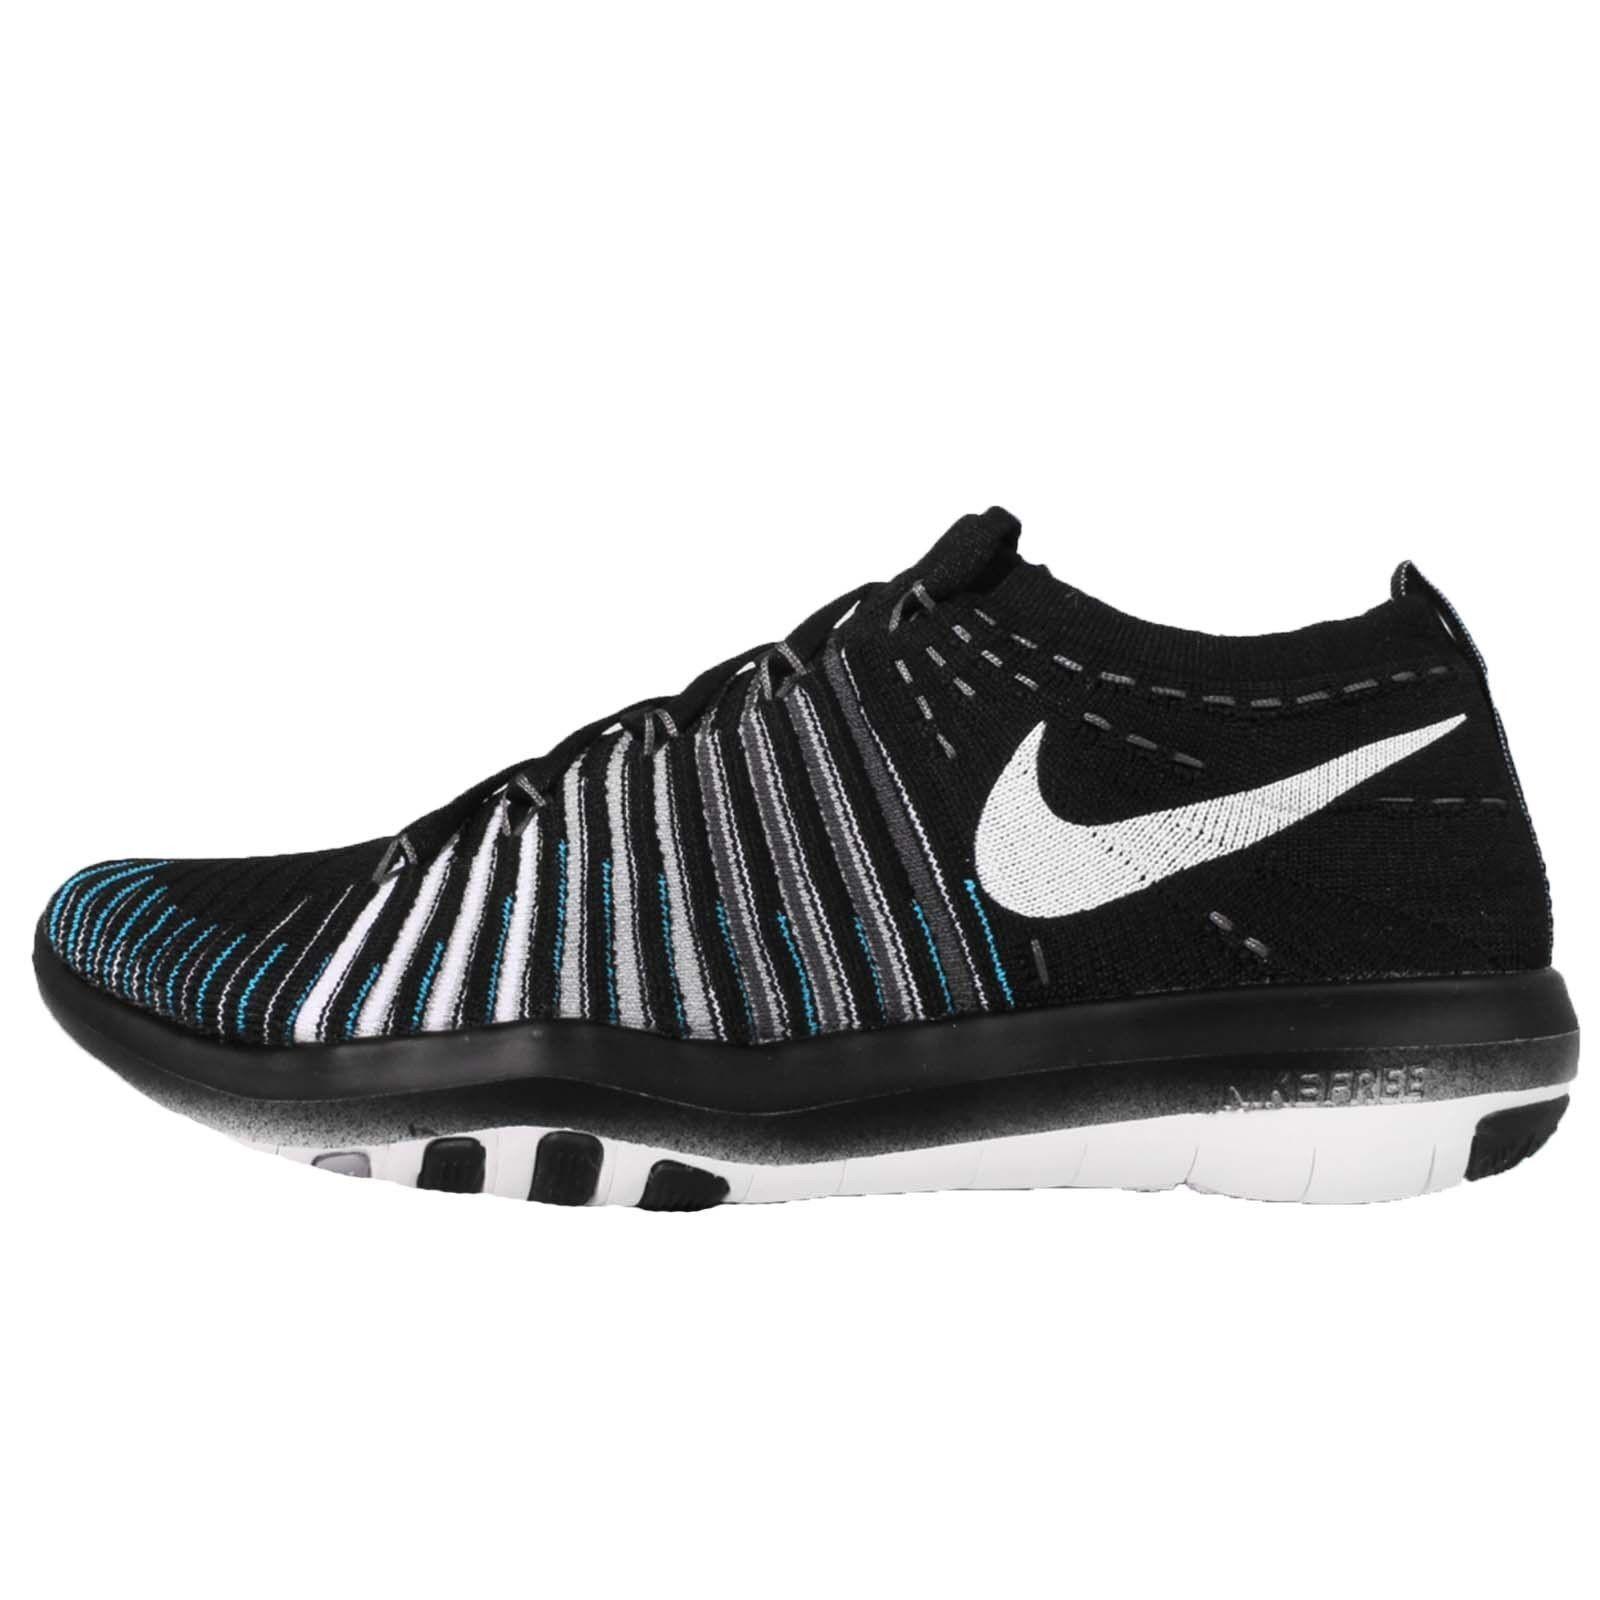 Wmn's Nike Free Transform Flyknit Running shoes Blk Wht Grey 833410 001 Sz 8.5